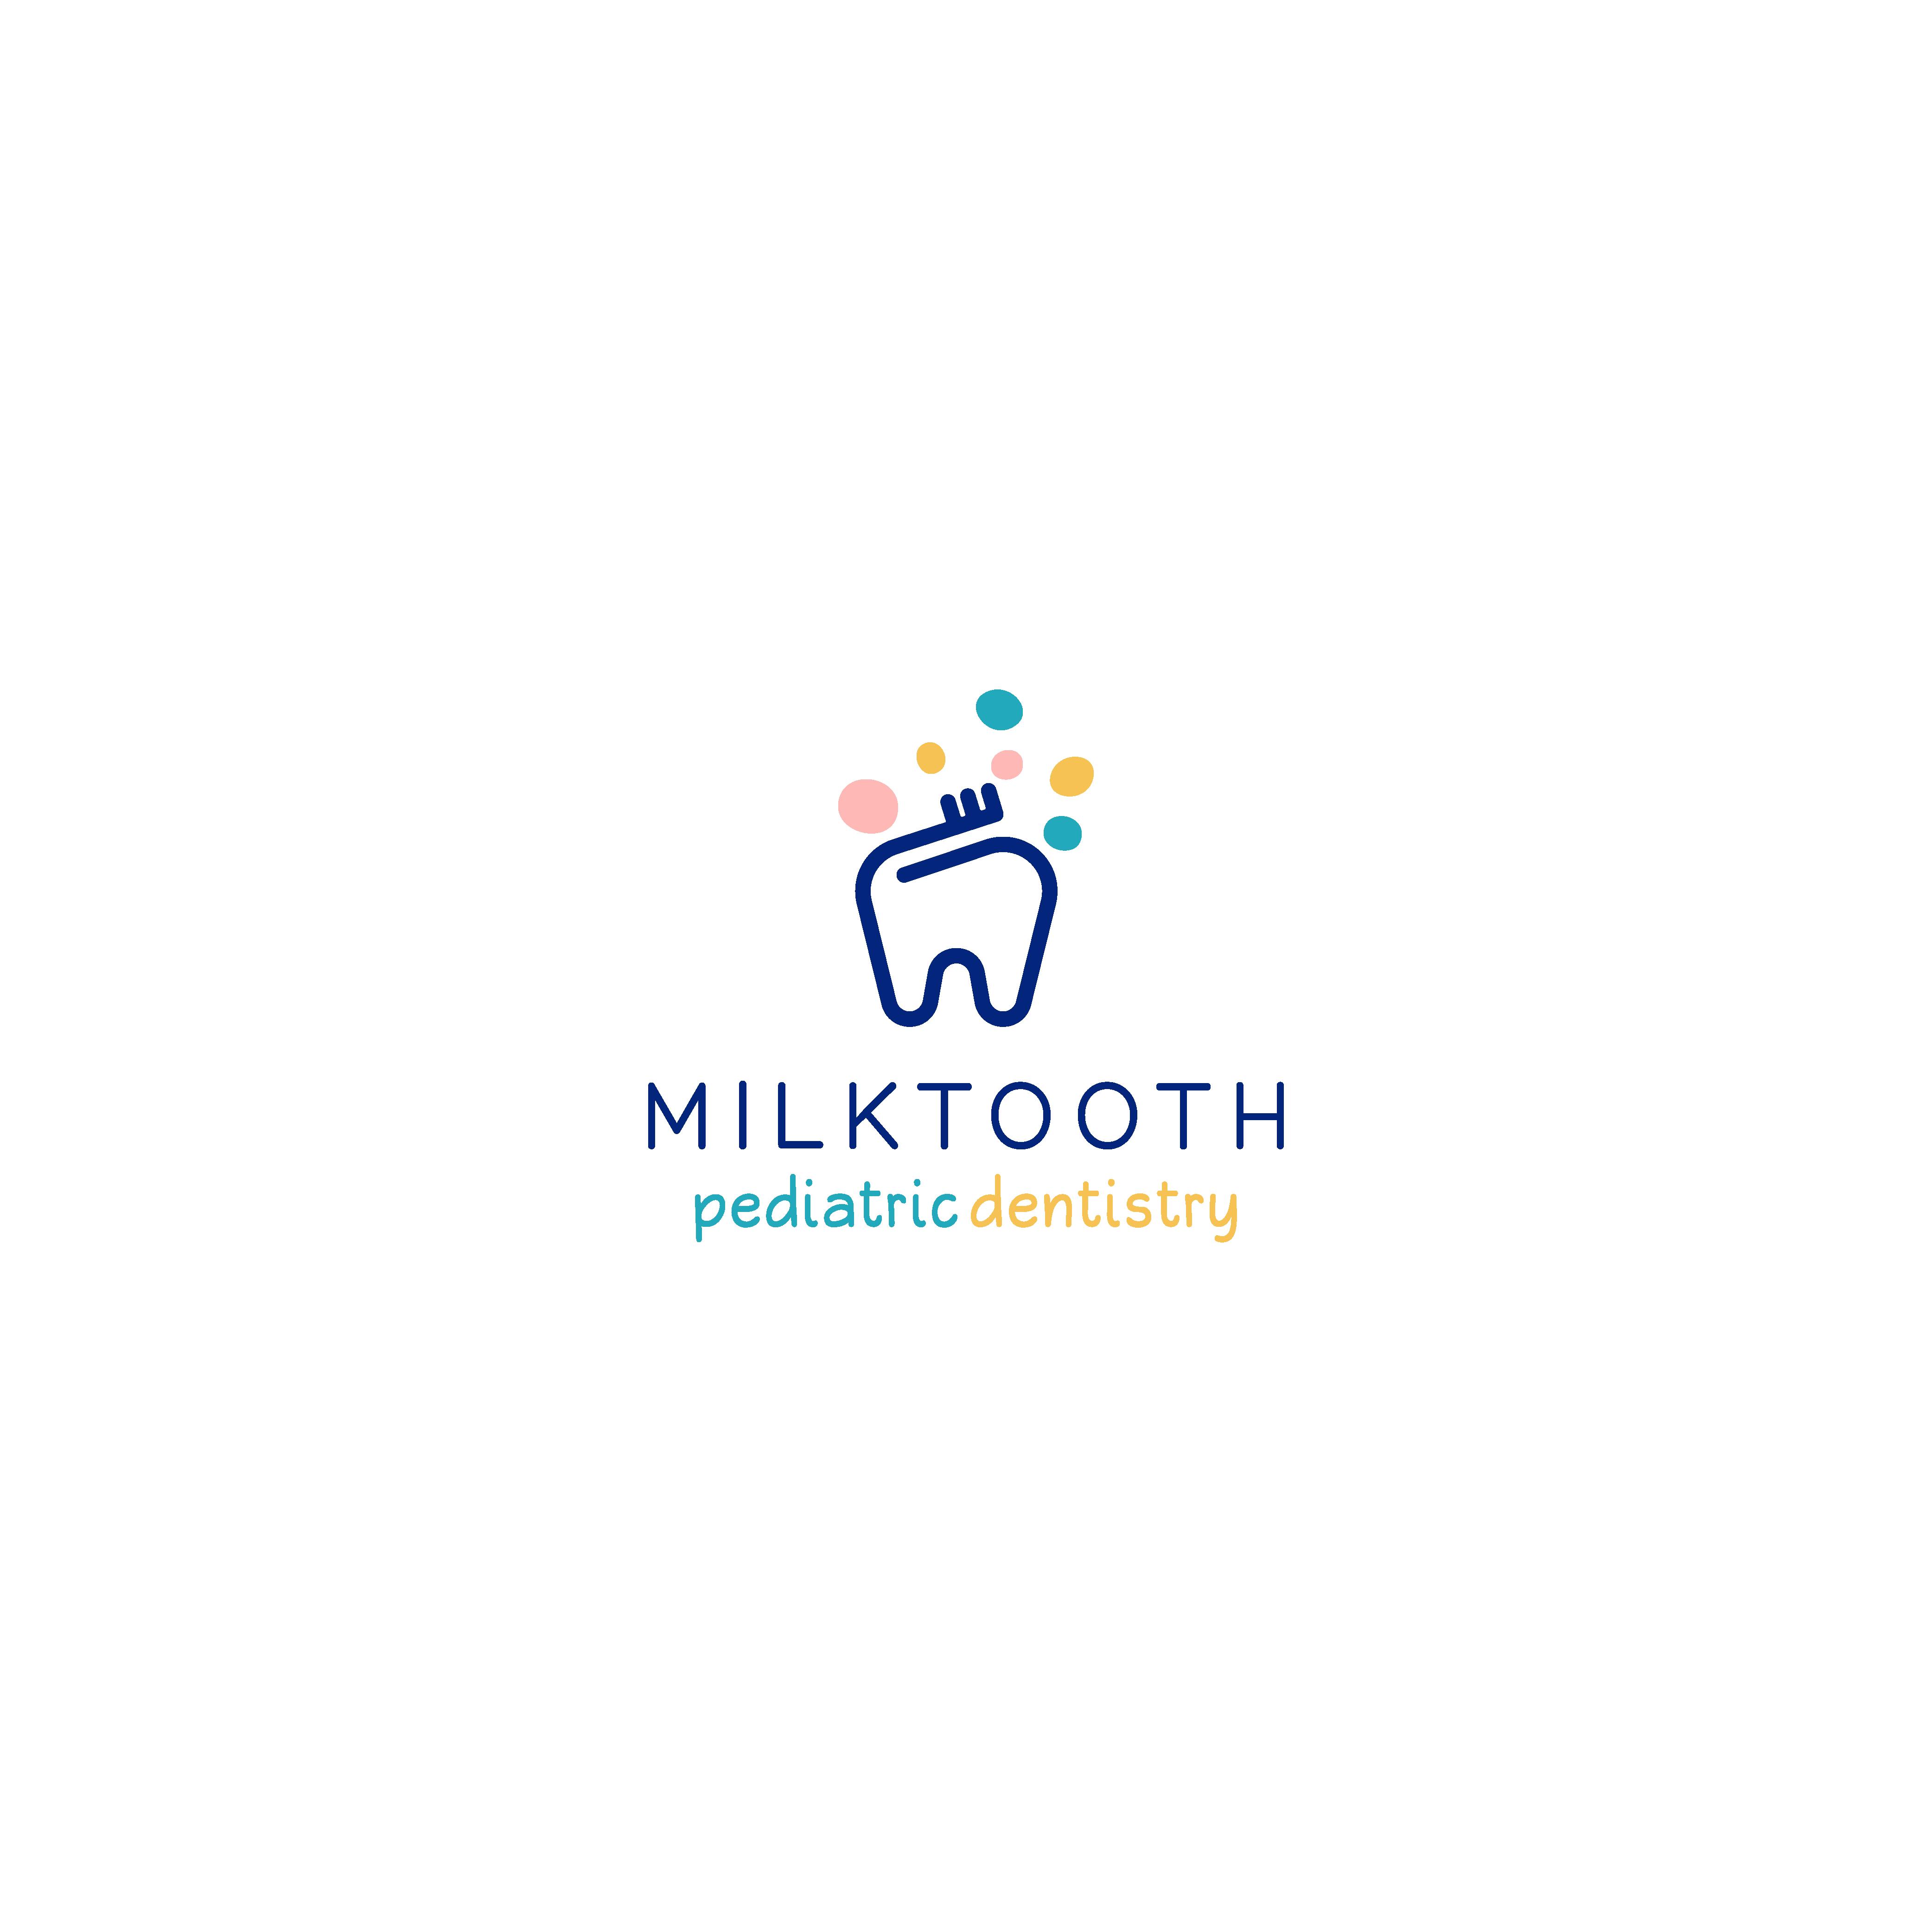 Help me create a fun and hip logo for my pediatric dental practice